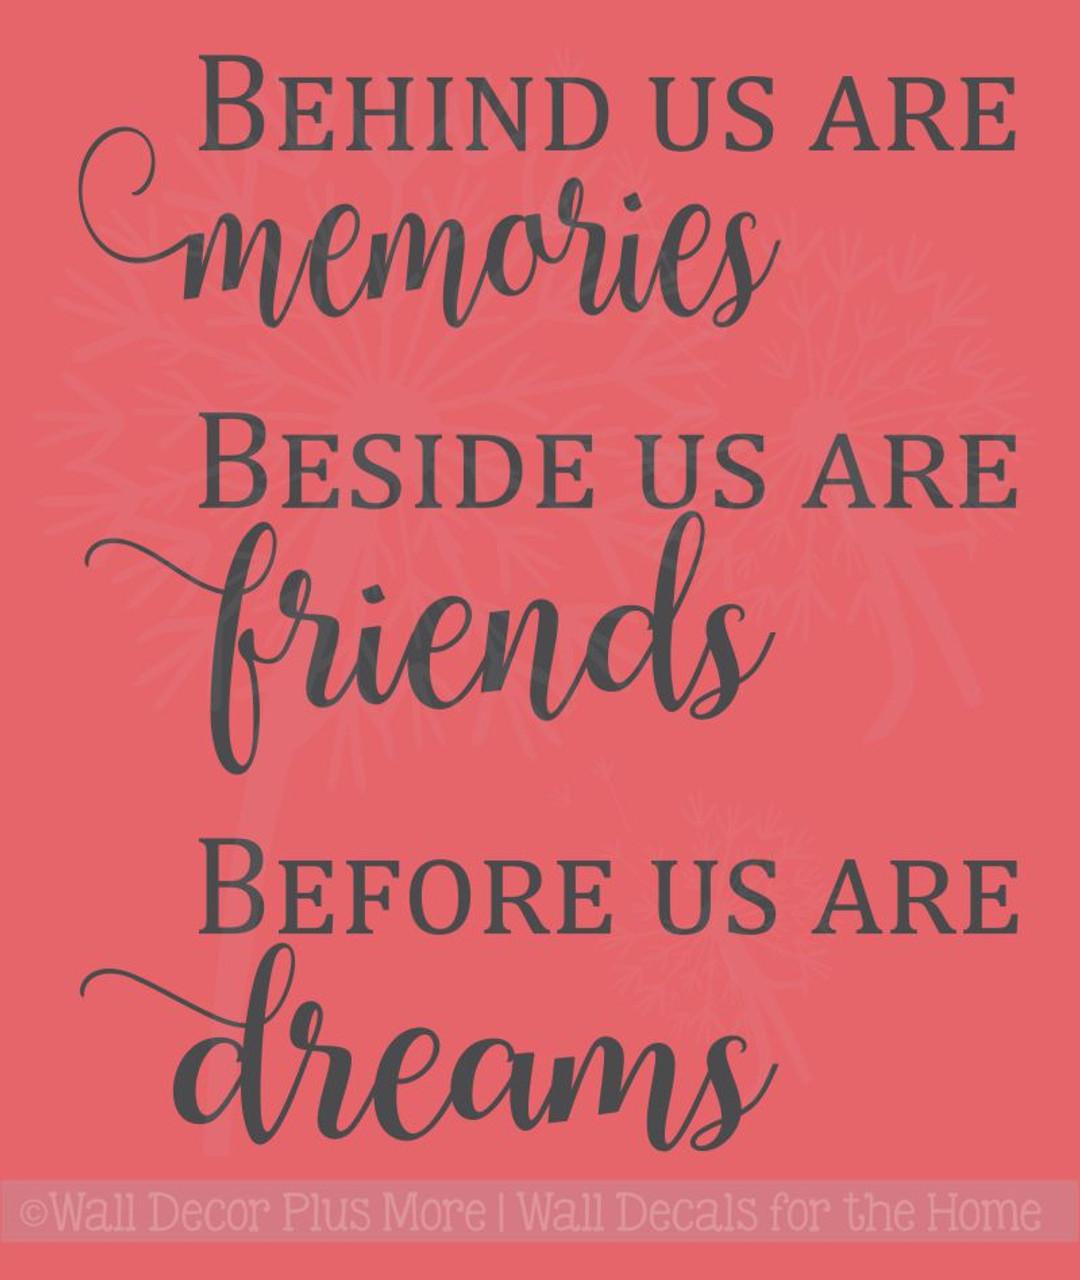 Memories, Friends, Dreams Vinyl Lettering Art Family Wall Sticker Decals  Kitchen Home Decor